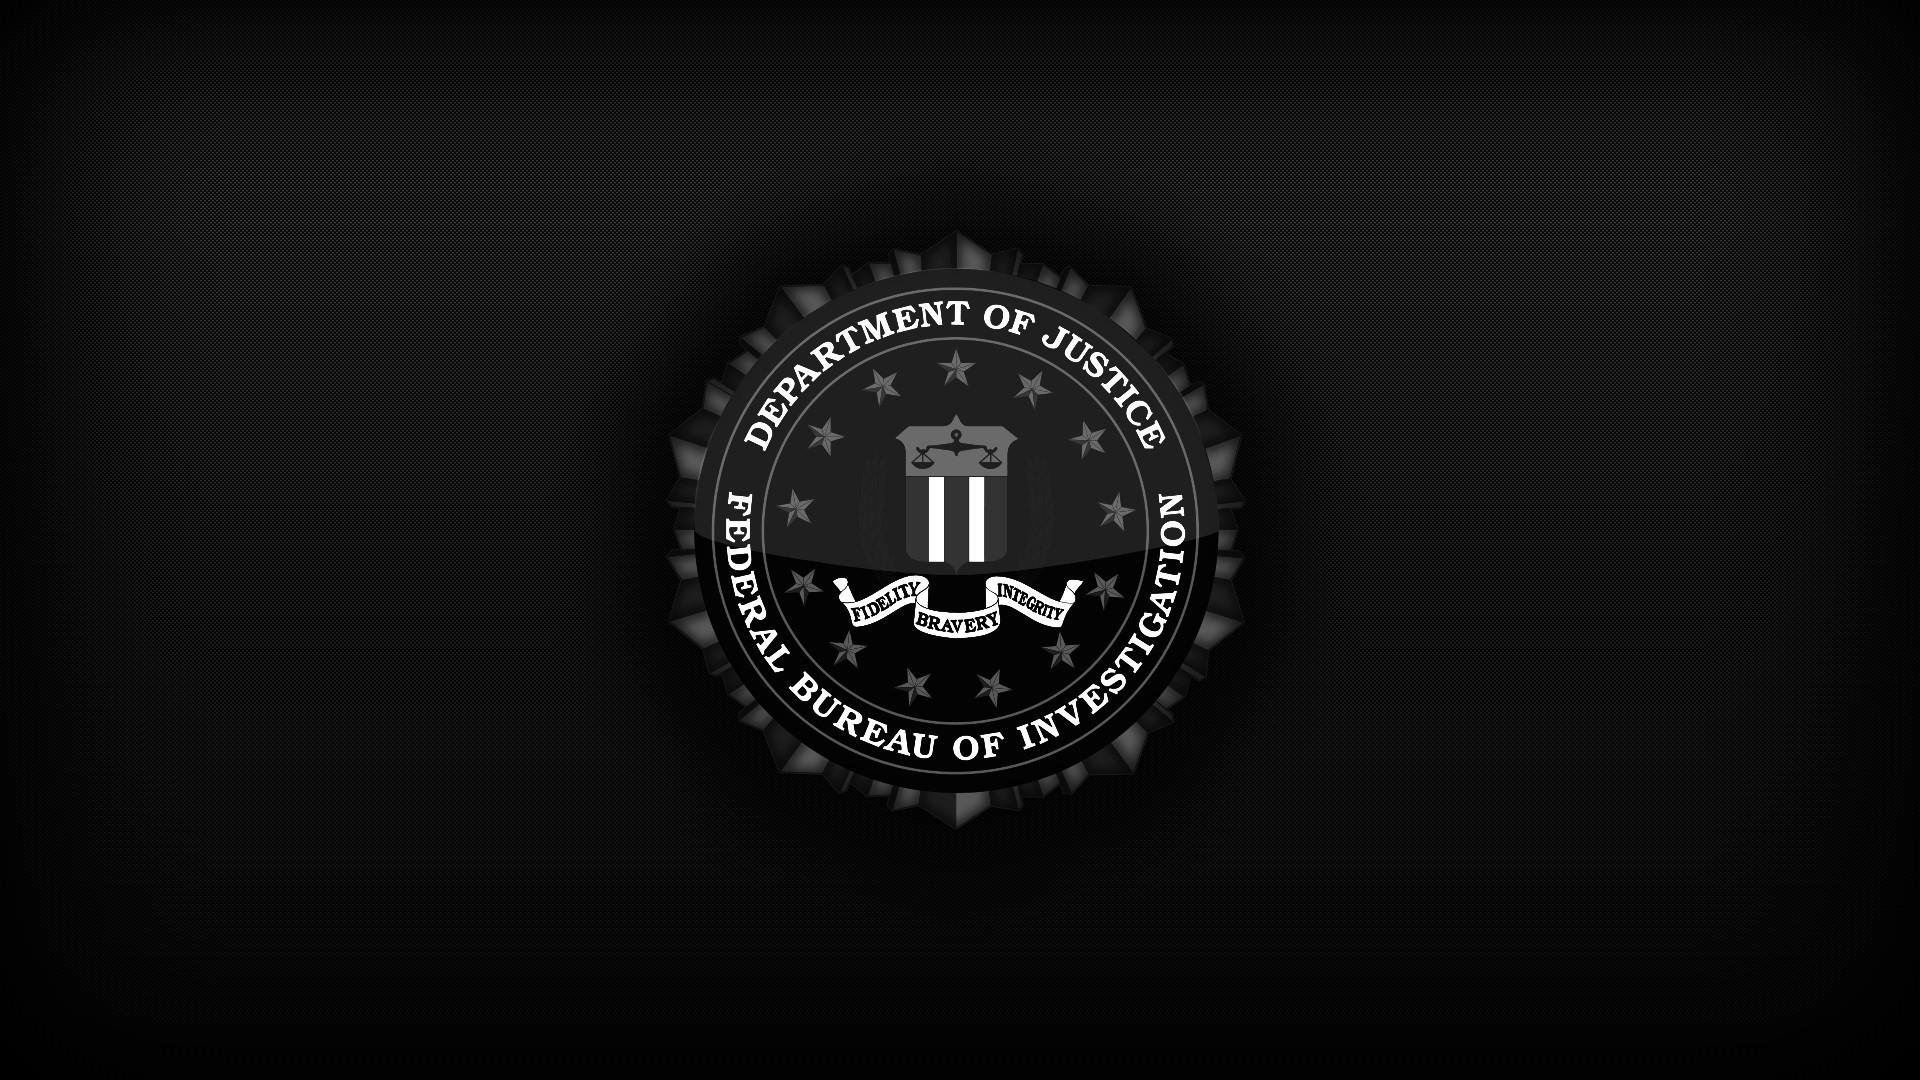 digital-intifada 3.0: The official website server of Federal